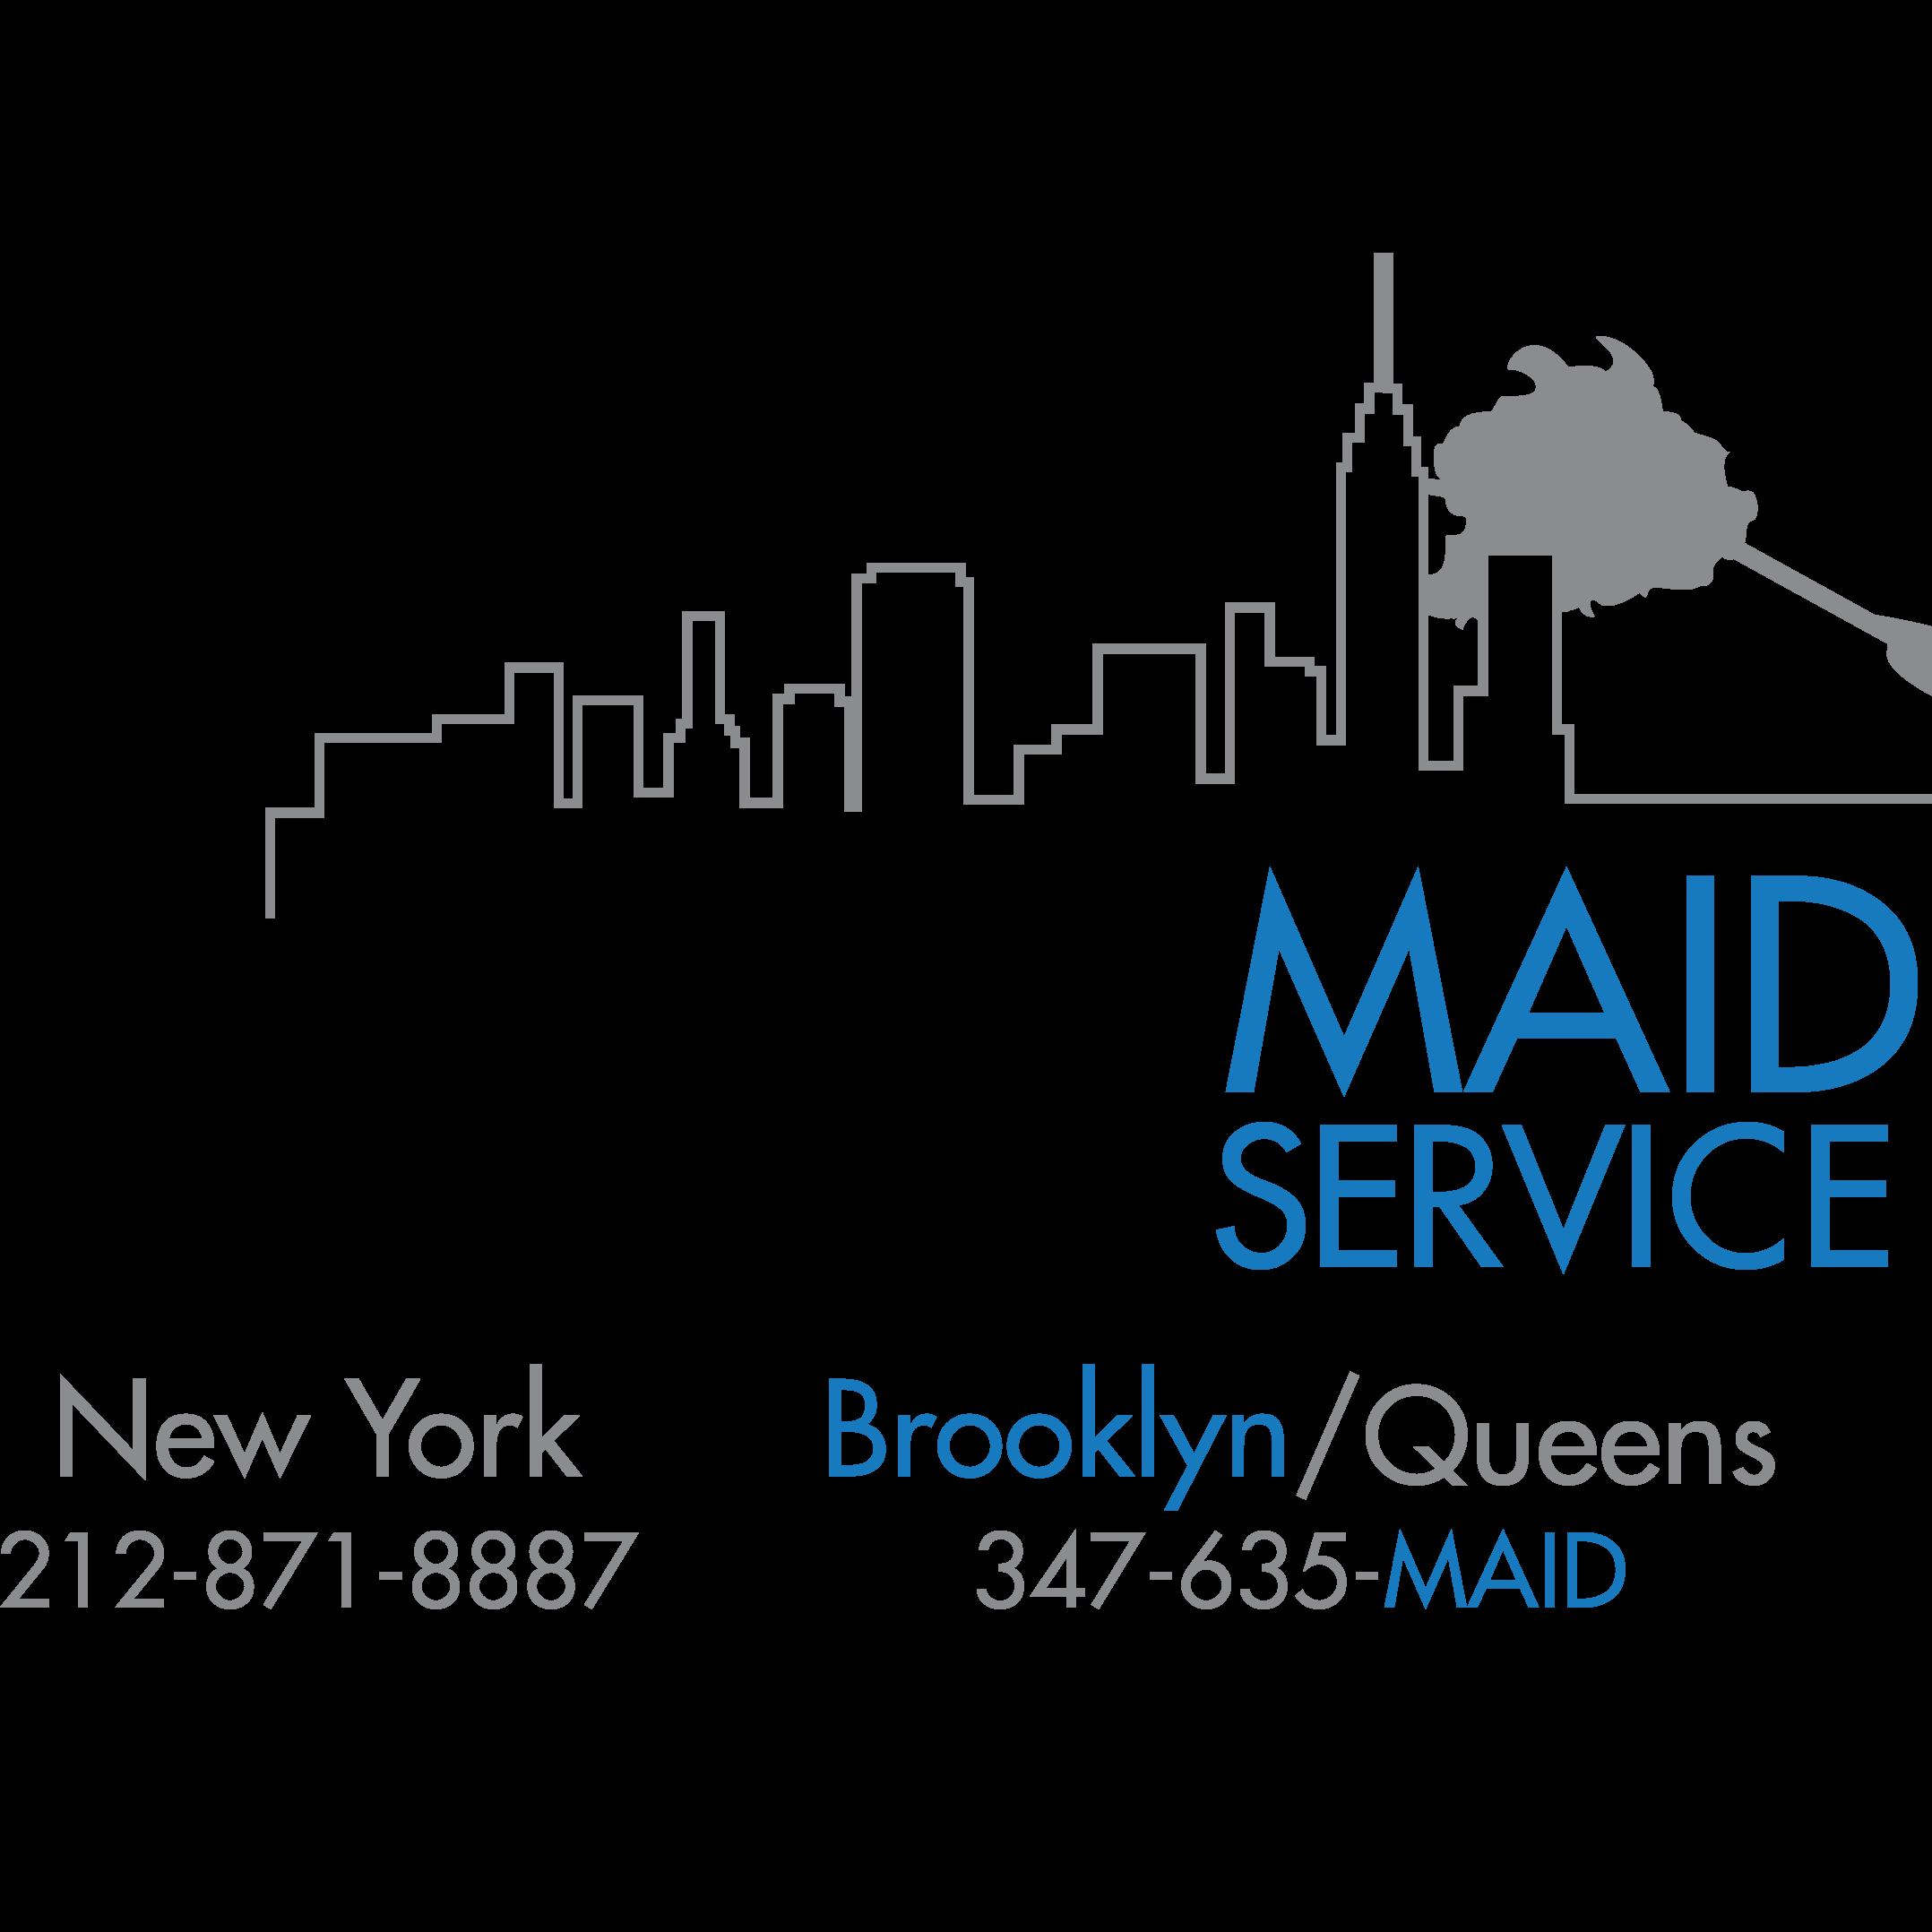 City Maid Service